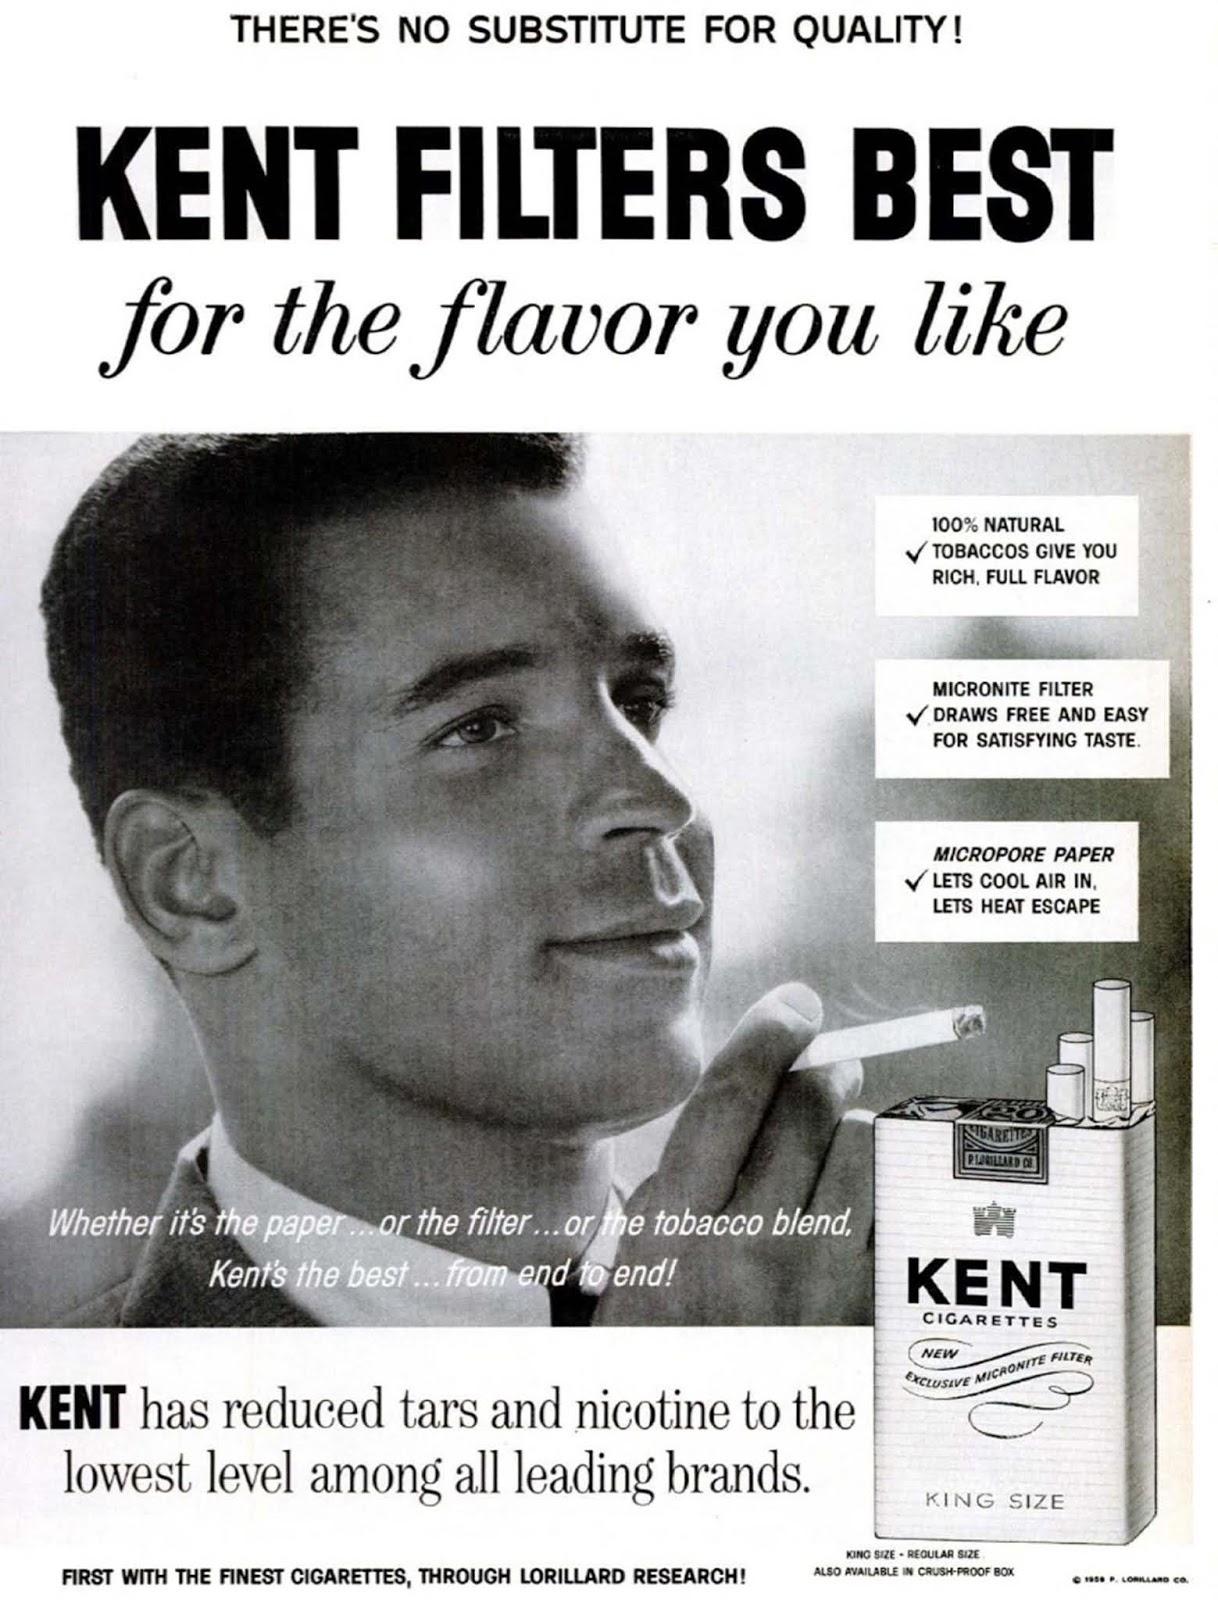 American-advertising-targeted-toward African-Americans